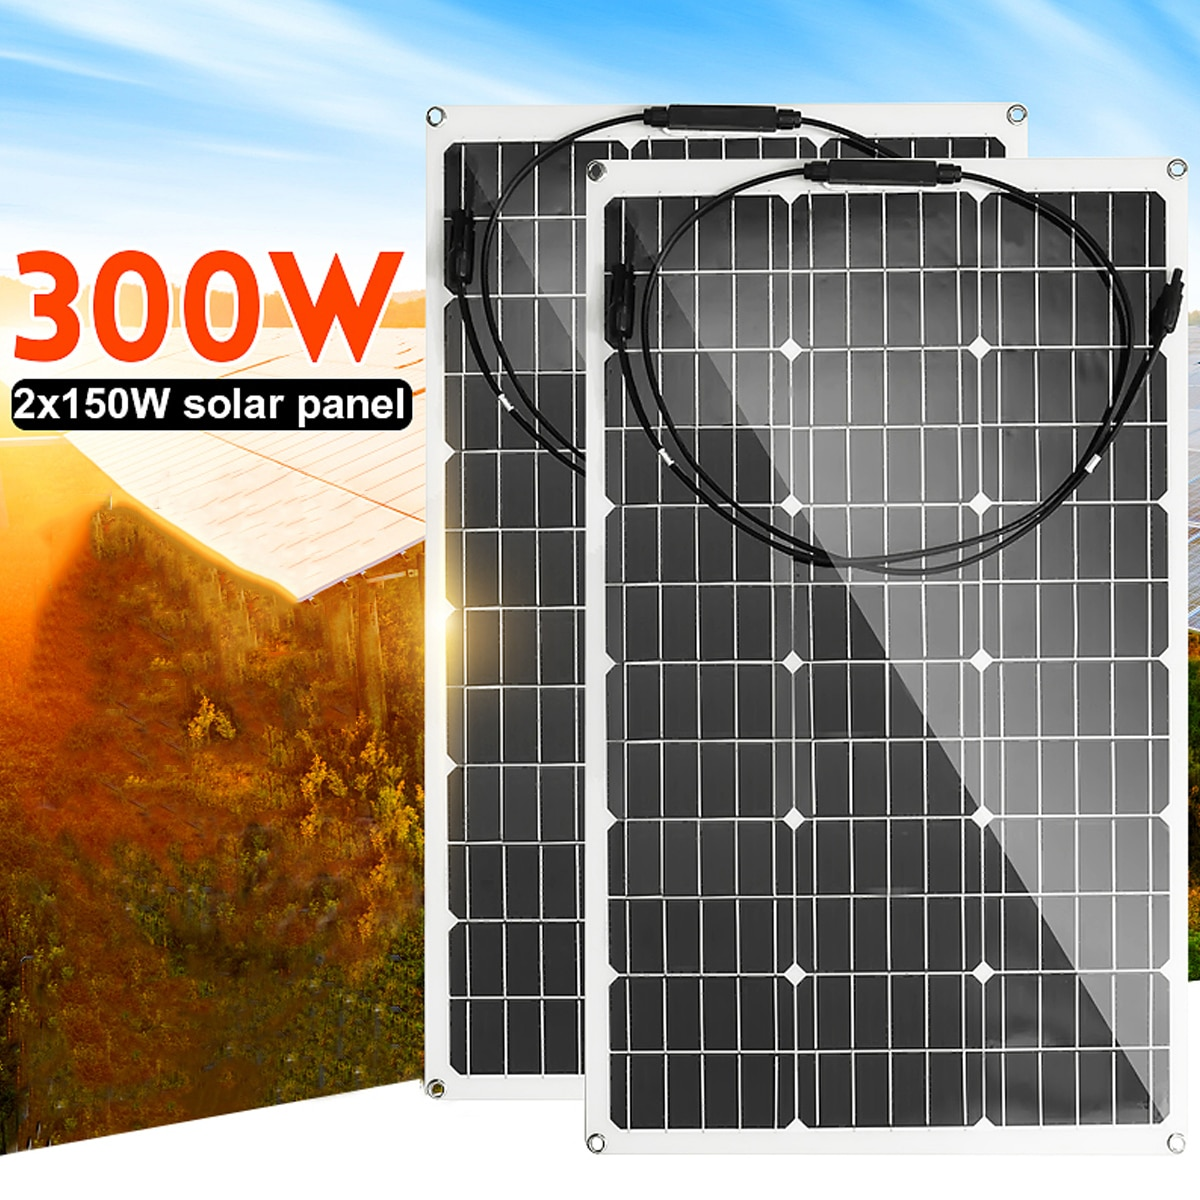 300W/150W, Panel Solar 18V, semiflexible monocristalina celda Solar, Cable DIY, conector para exteriores, cargador de batería